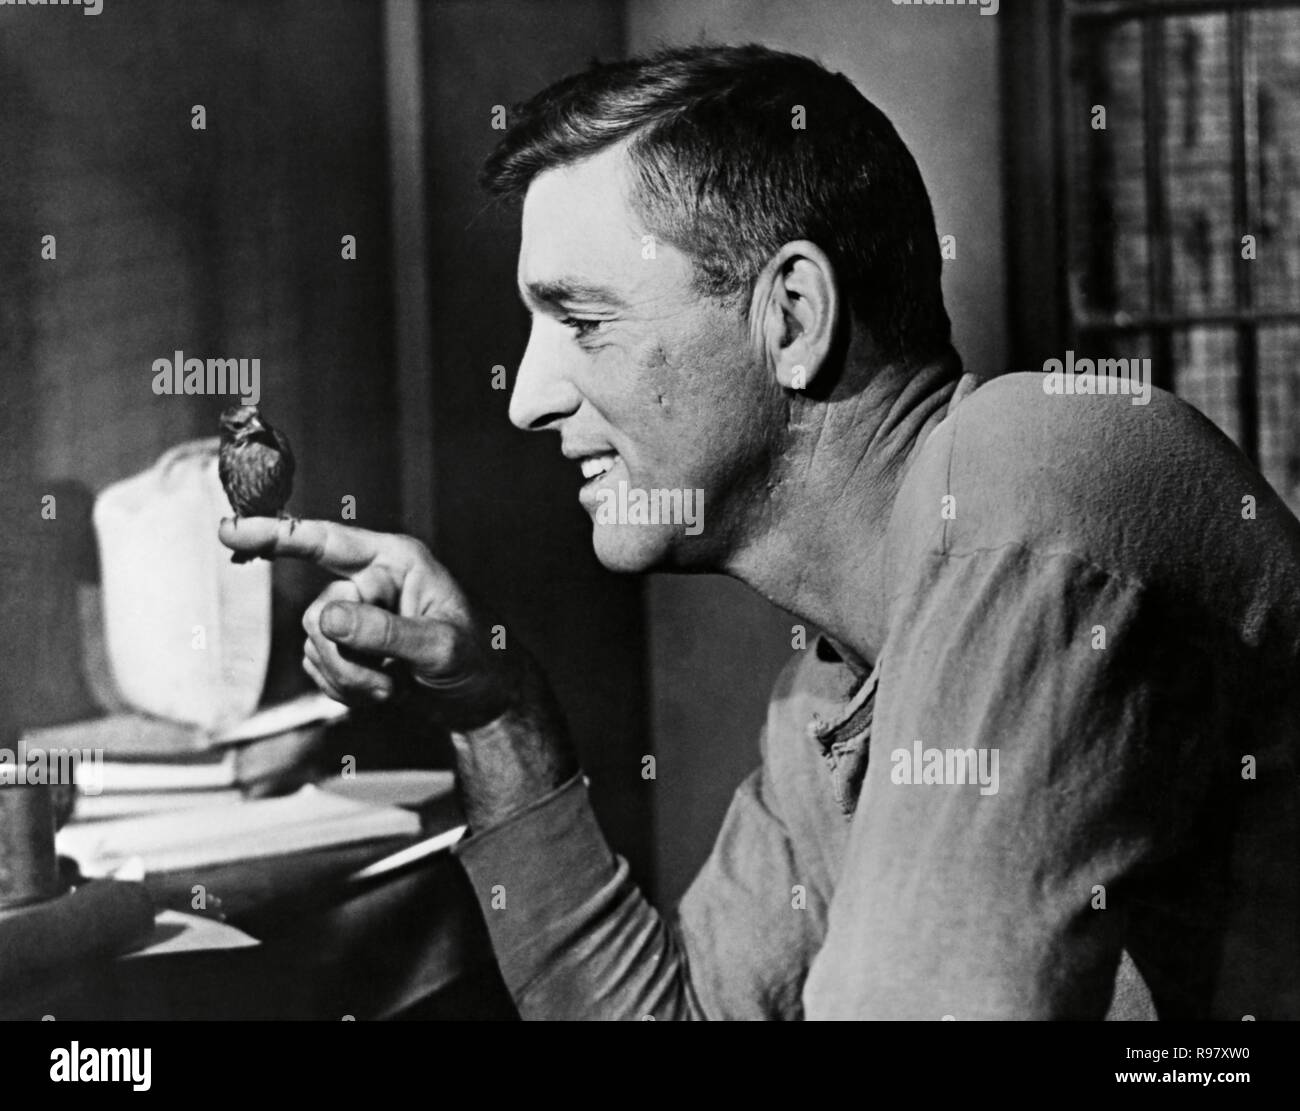 Original film title: BIRDMAN OF ALCATRAZ. English title: BIRDMAN OF ALCATRAZ. Year: 1962. Director: JOHN FRANKENHEIMER. Stars: BURT LANCASTER. Credit: UNITED ARTISTS / Album Stock Photo